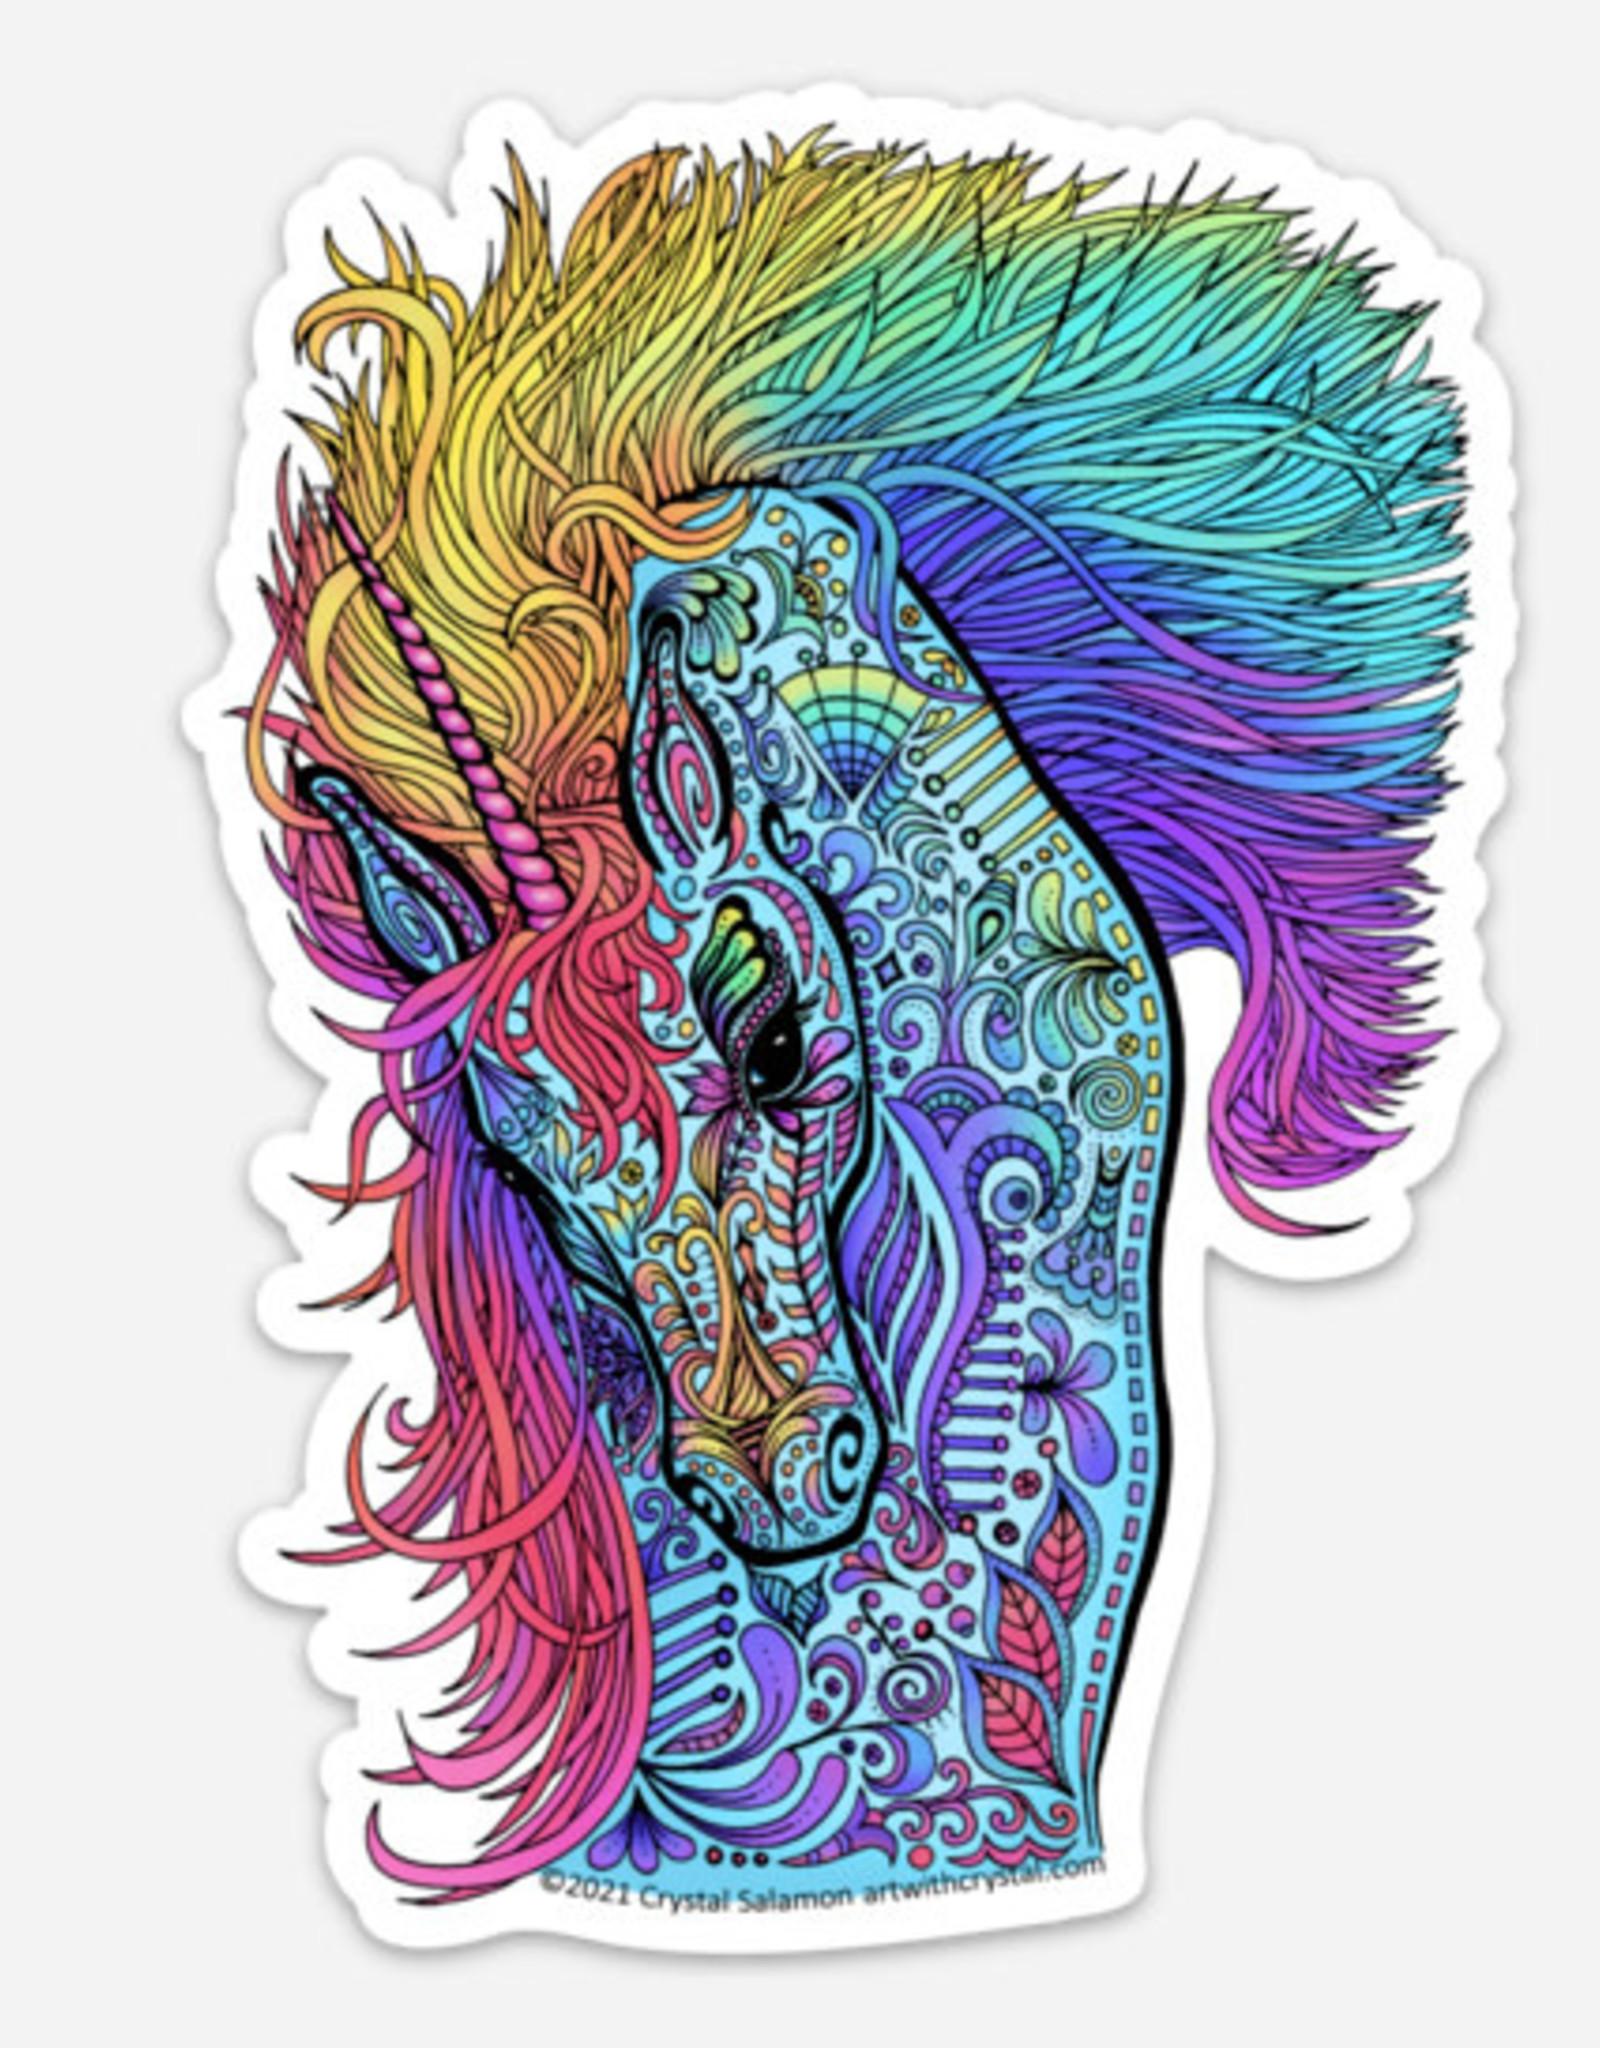 Crystal Salamon Coloured Sticker - Unicorn